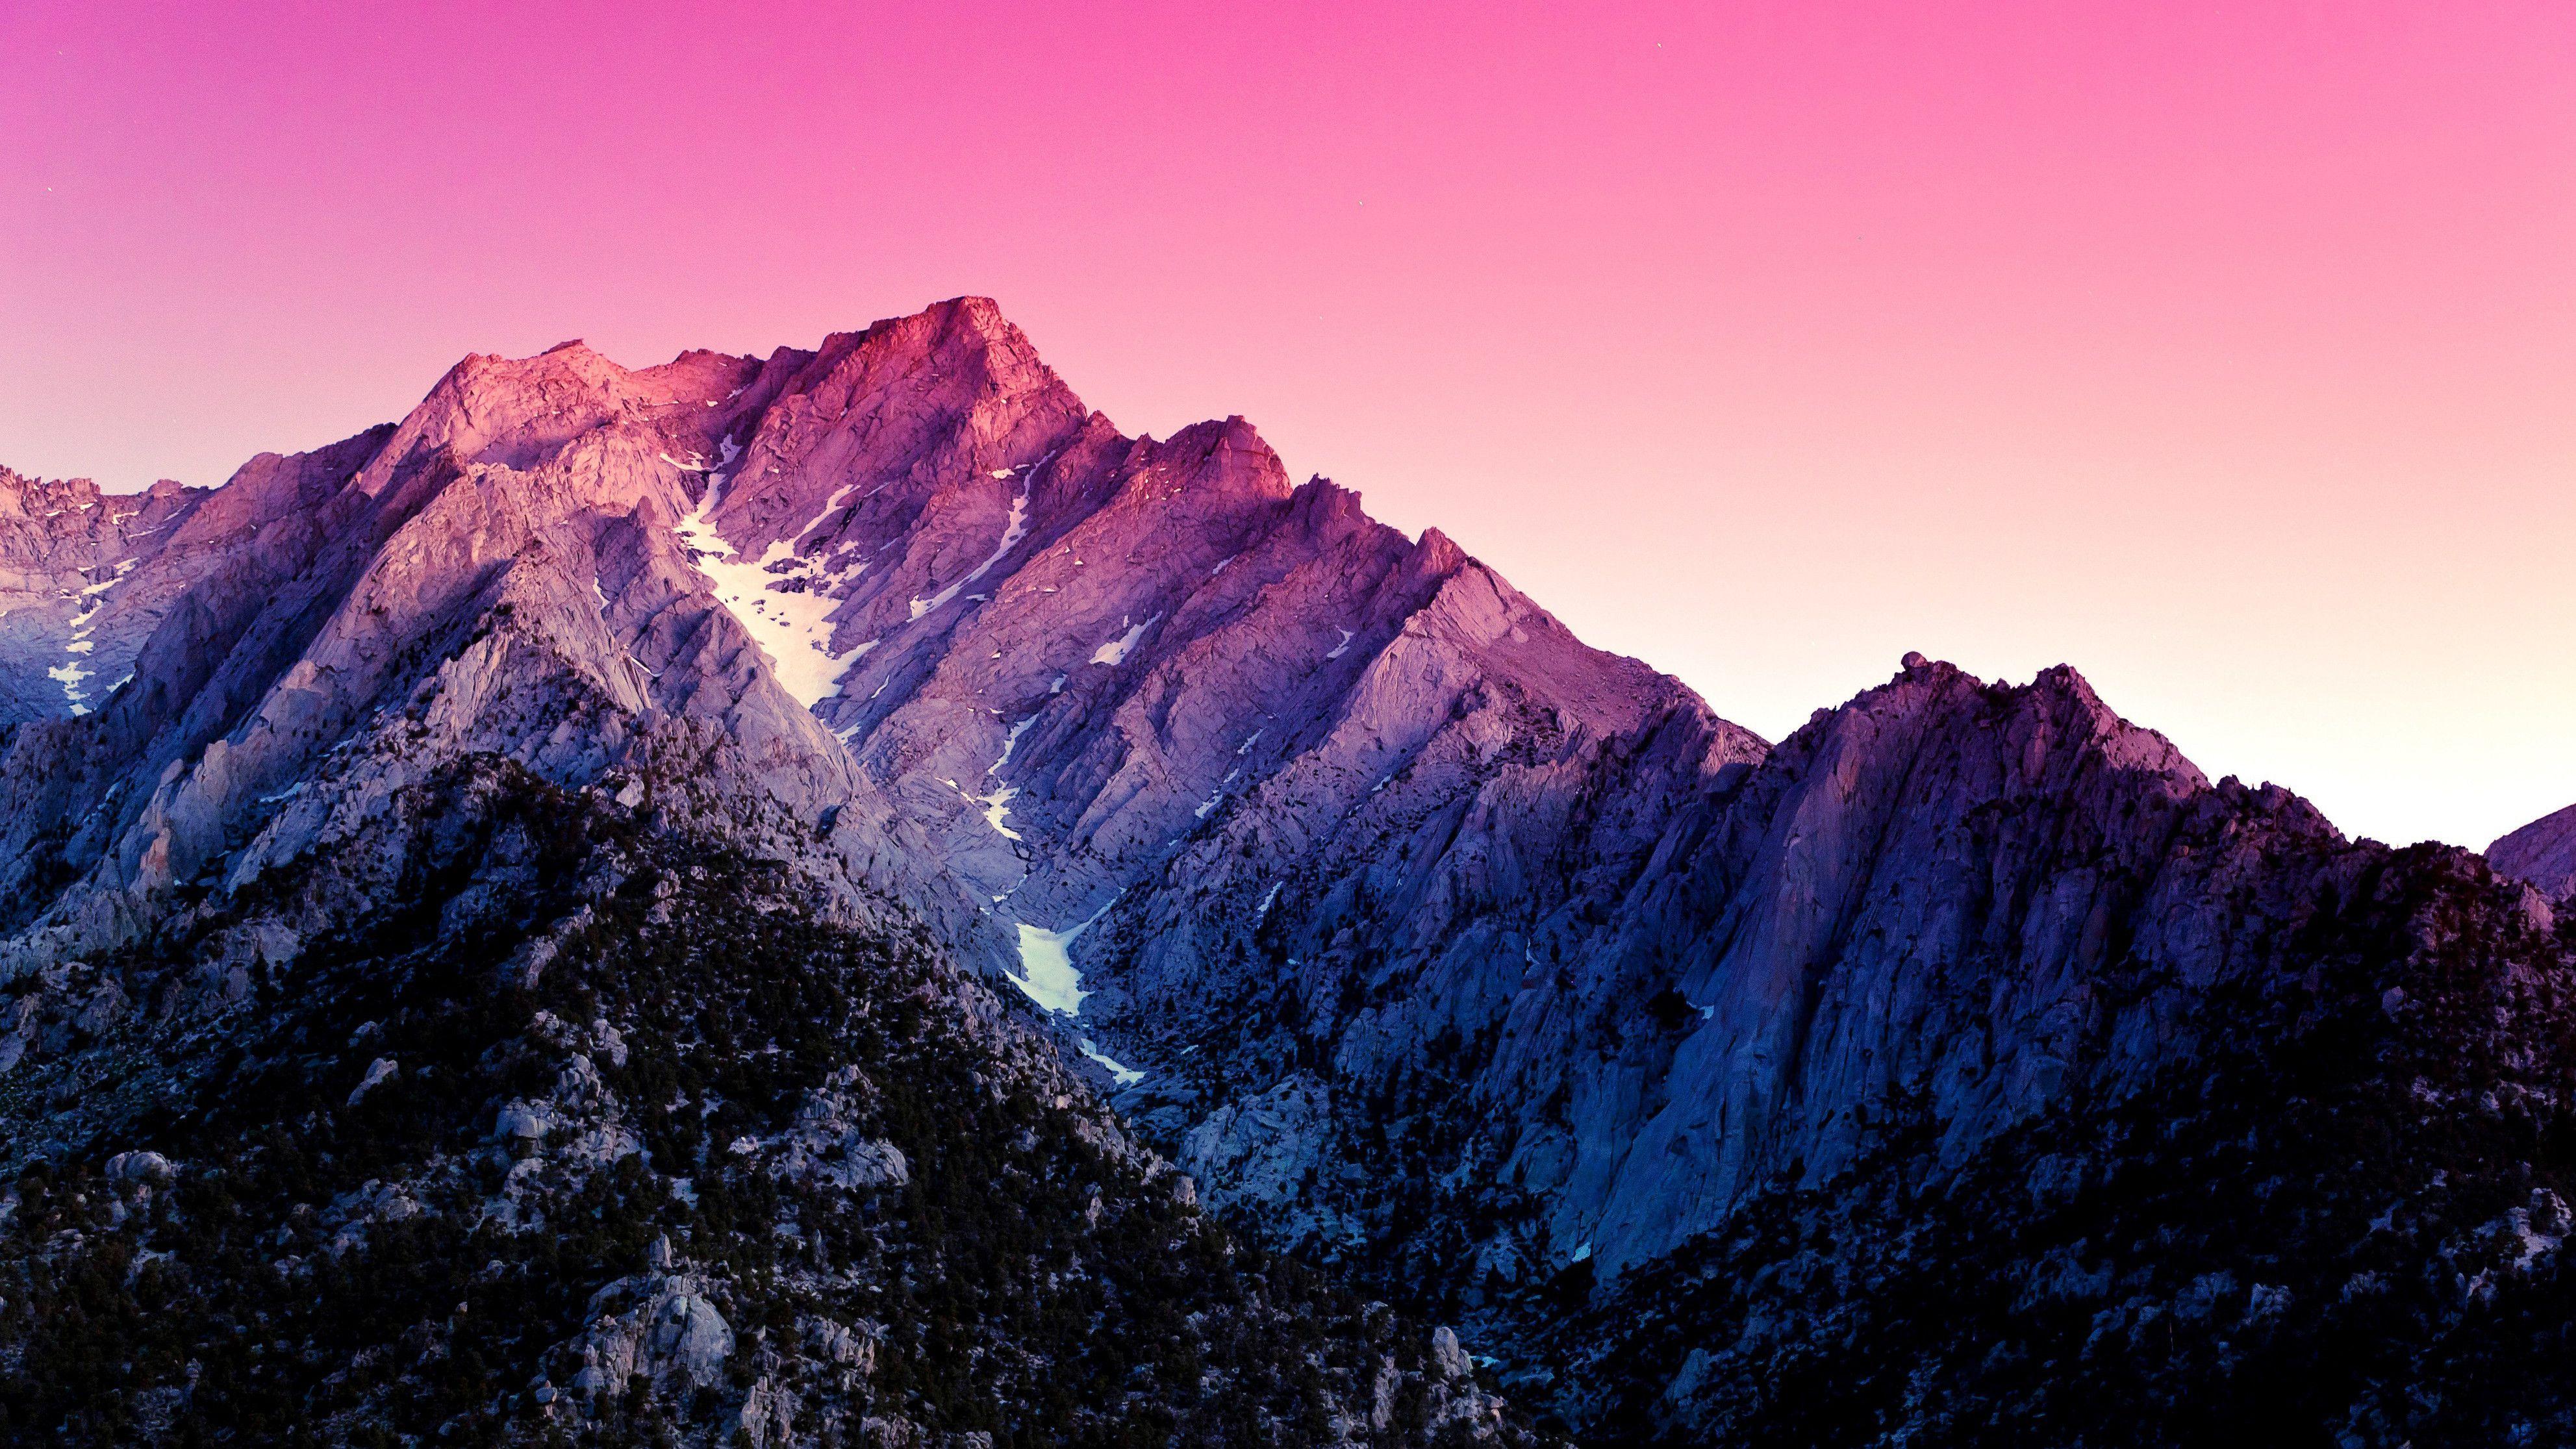 100 1920x1080 Wallpapers In 2020 Mountain Wallpaper Macbook Air